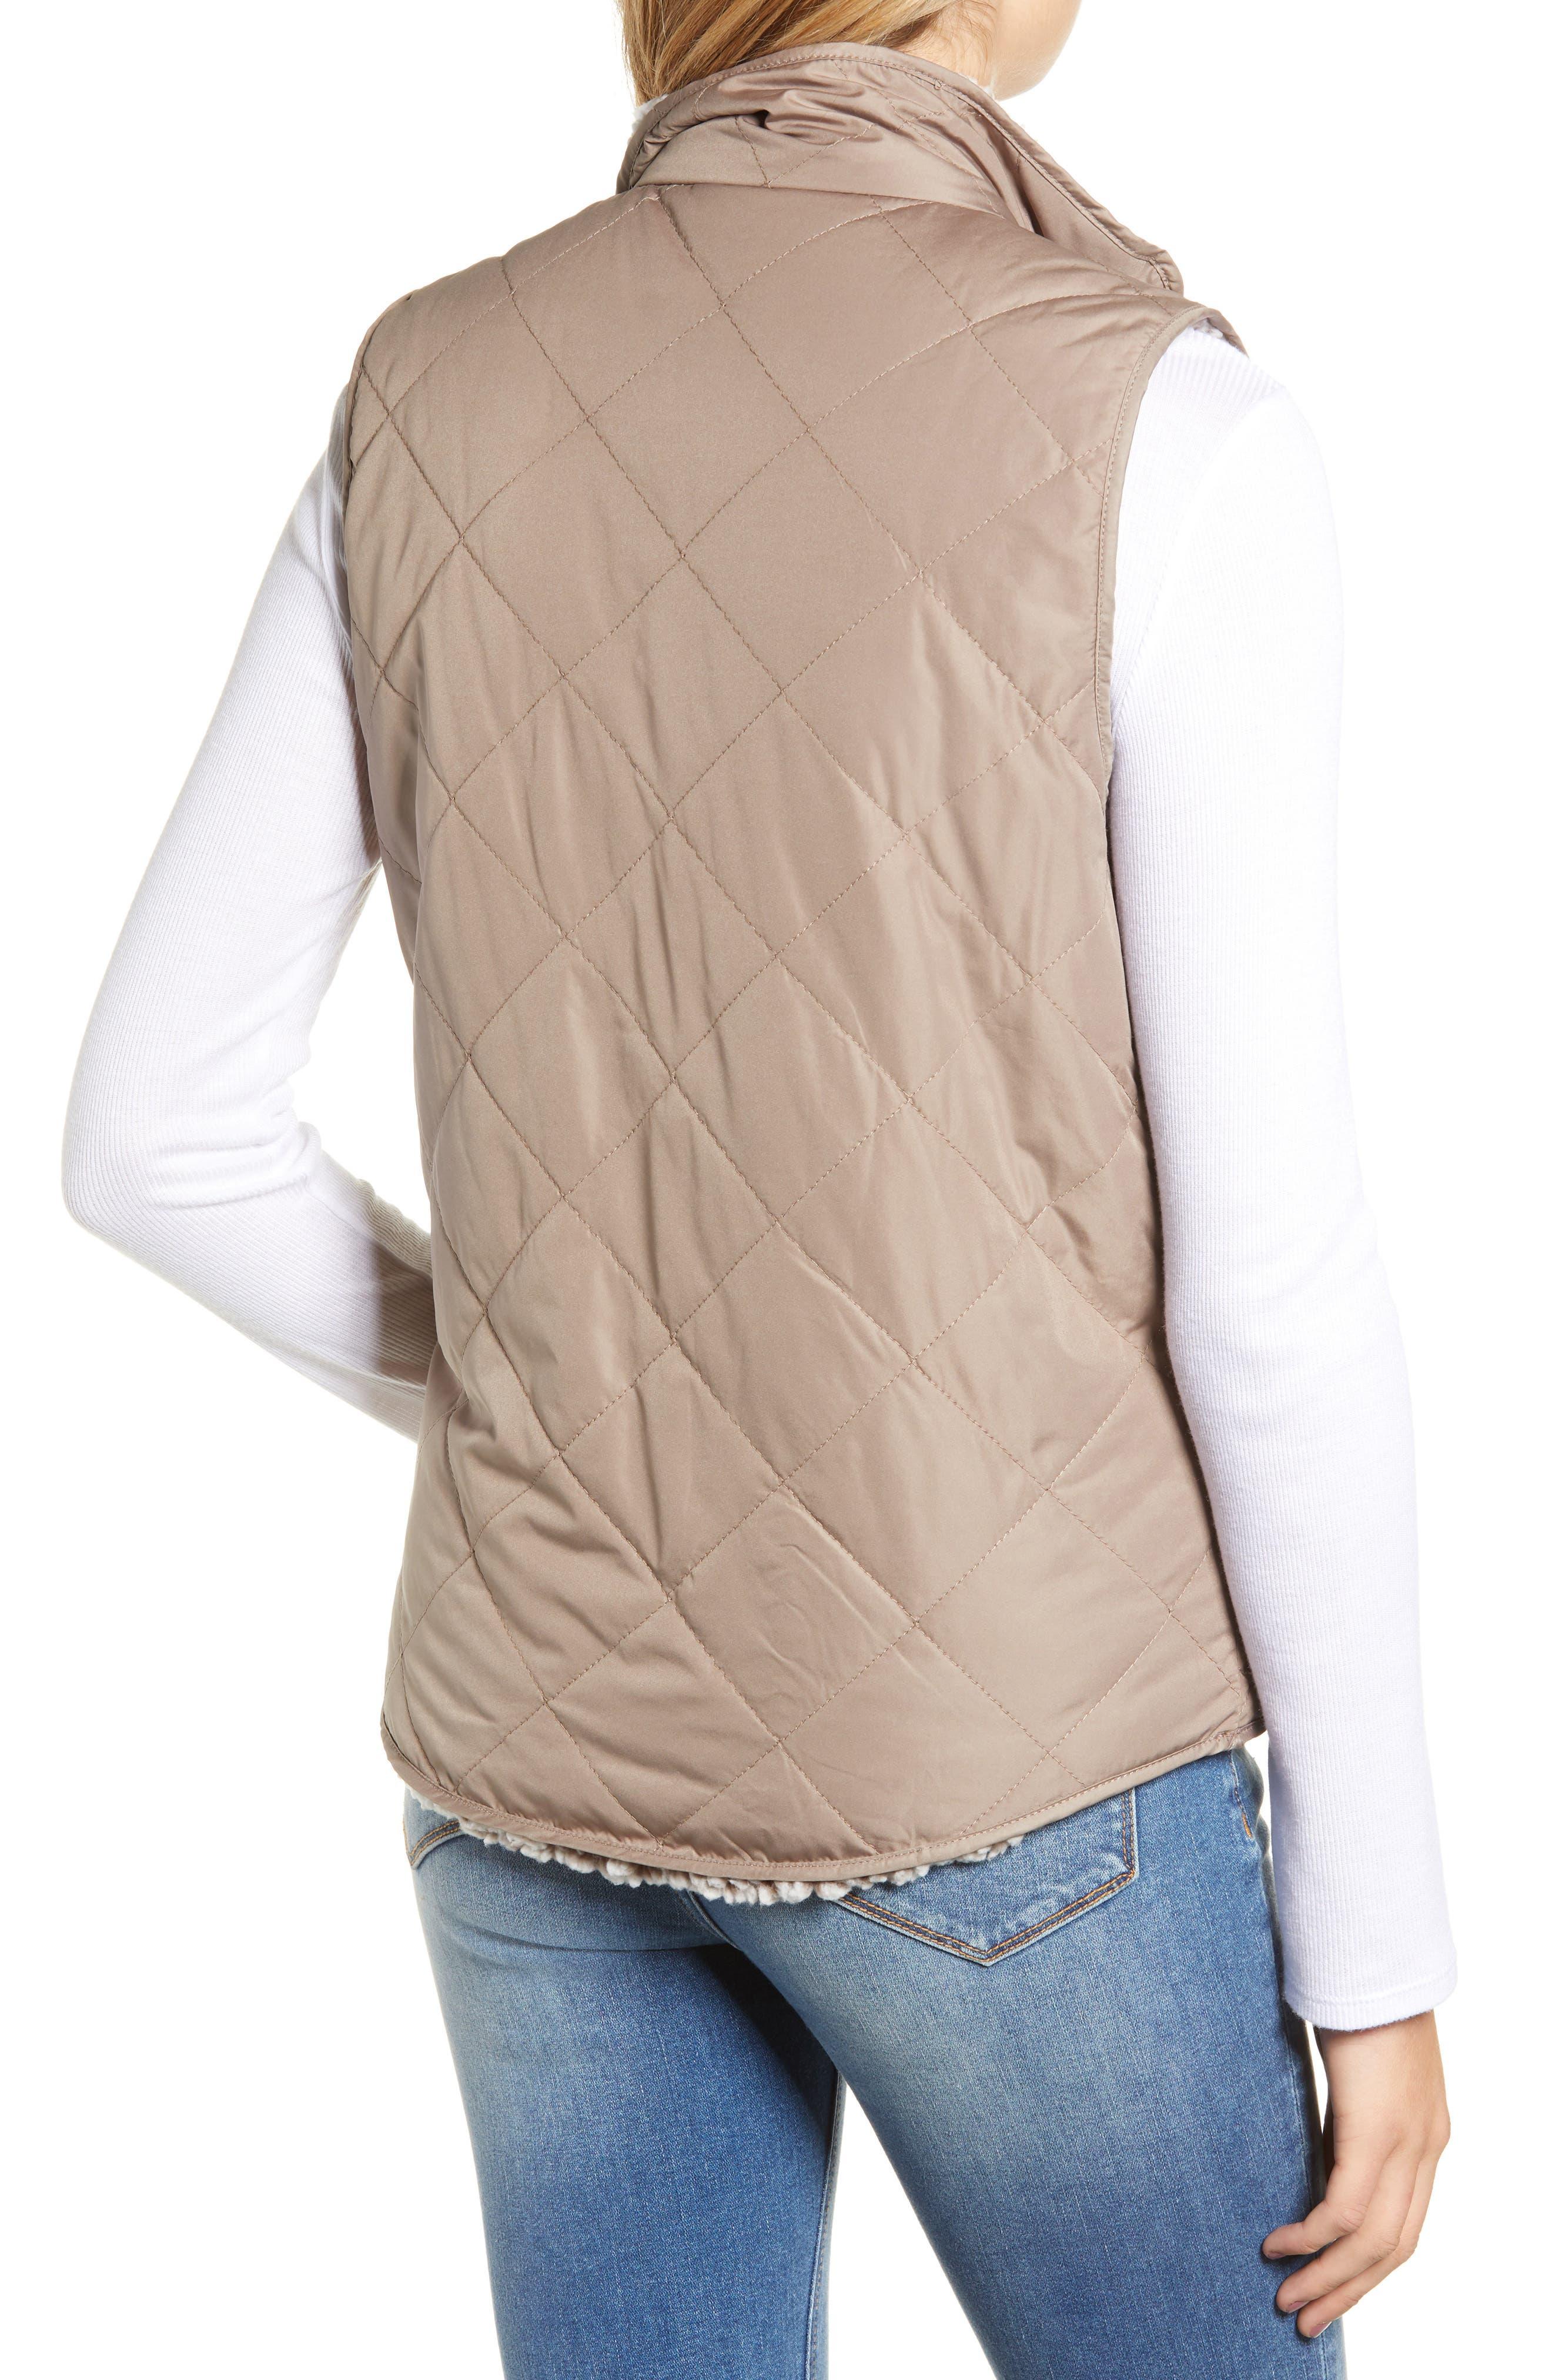 Reversible Fleece Lined Quilted Vest,                             Alternate thumbnail 3, color,                             MUSHROOM